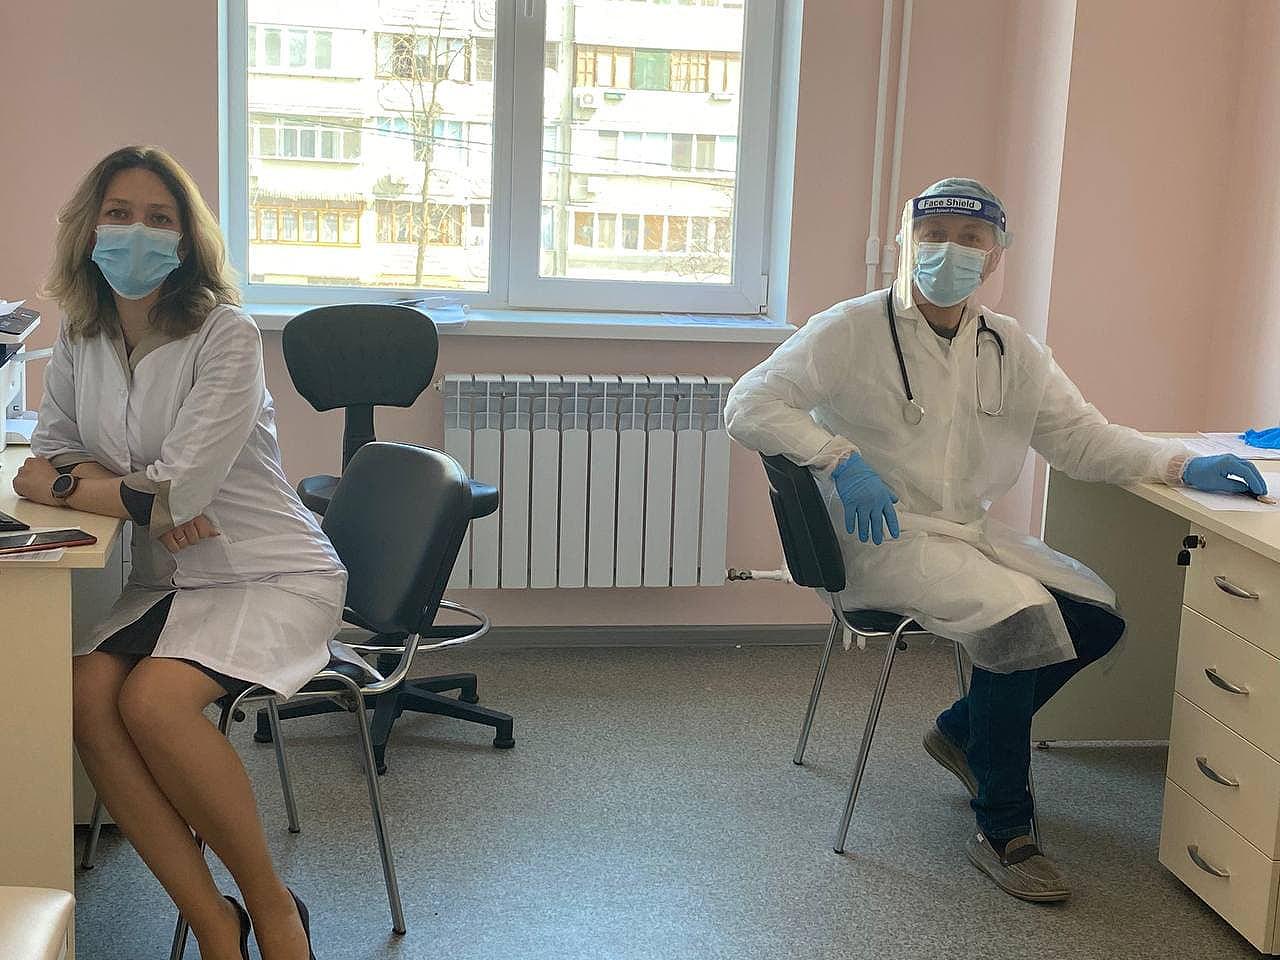 Наталья Шаповал и Владислав Охман ждут пациентов. Фото: Тамара Балаева